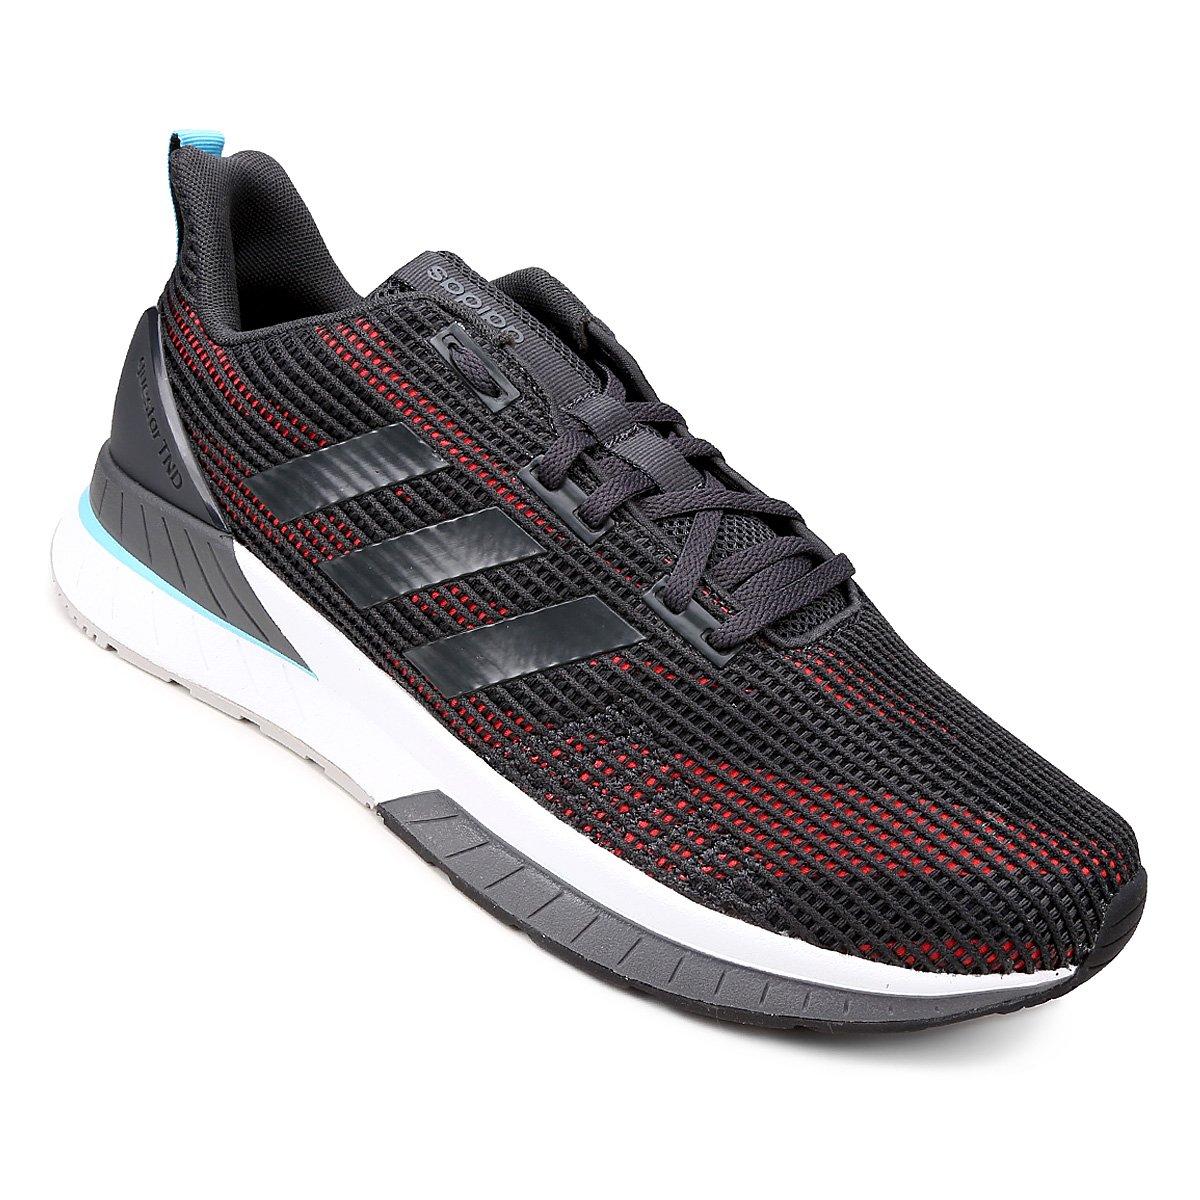 5ceeb5e9d71 Tênis Adidas Questar TND Masculino - Cinza e Laranja - Compre Agora ...